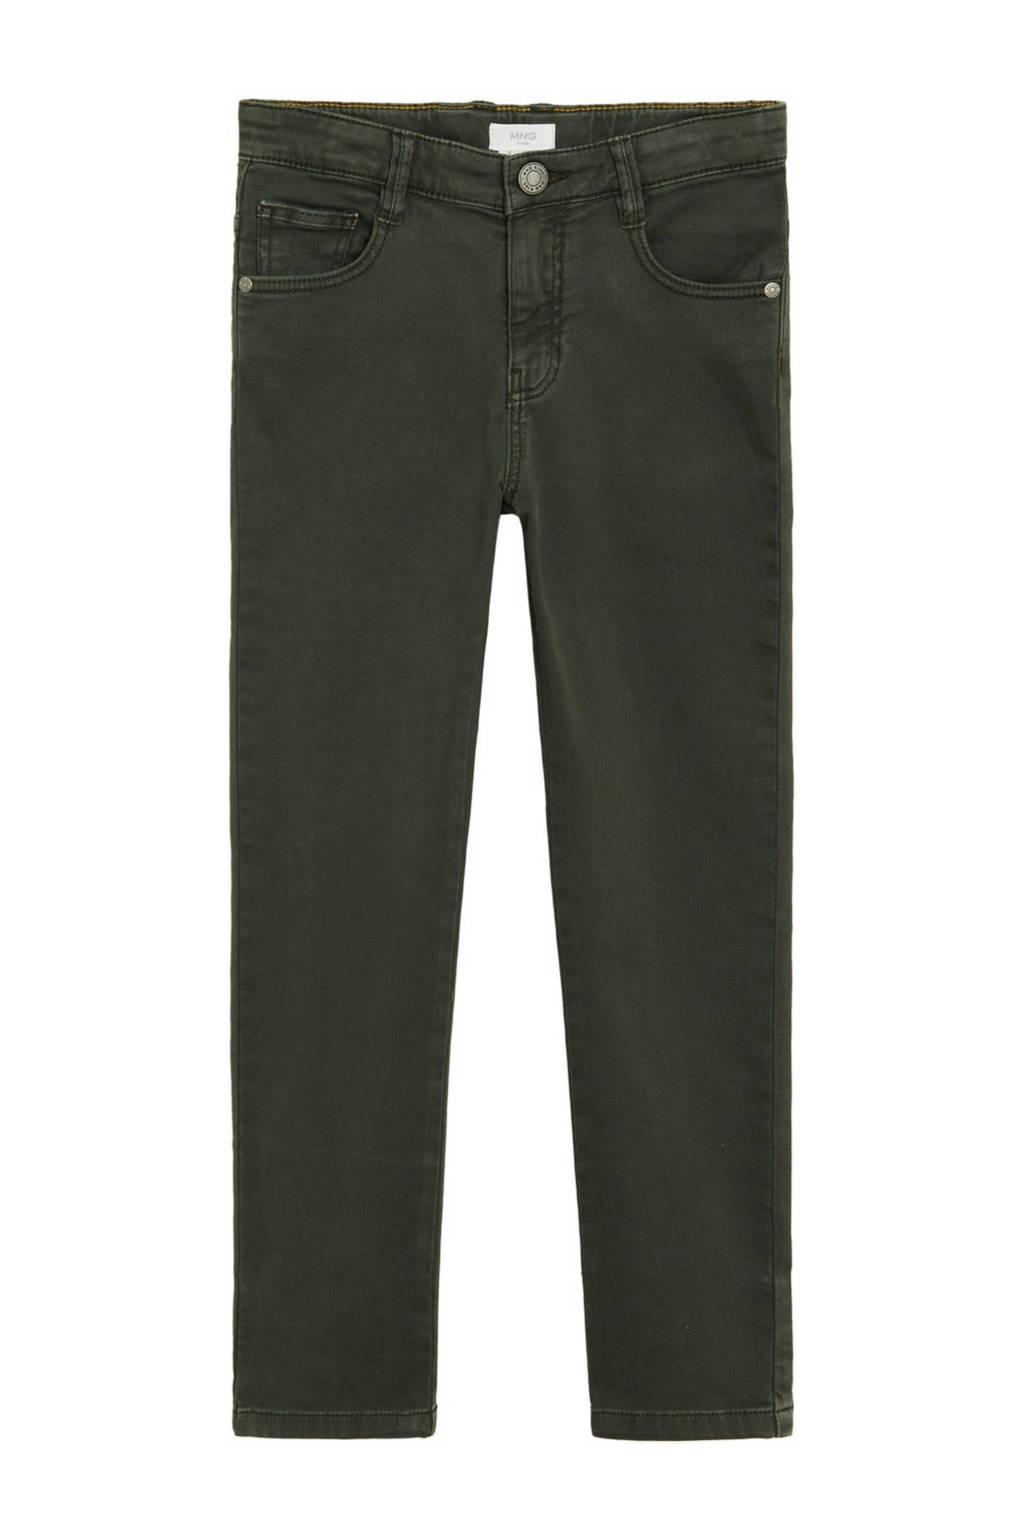 Mango Kids straight fit jeans khakigroen, Khakigroen